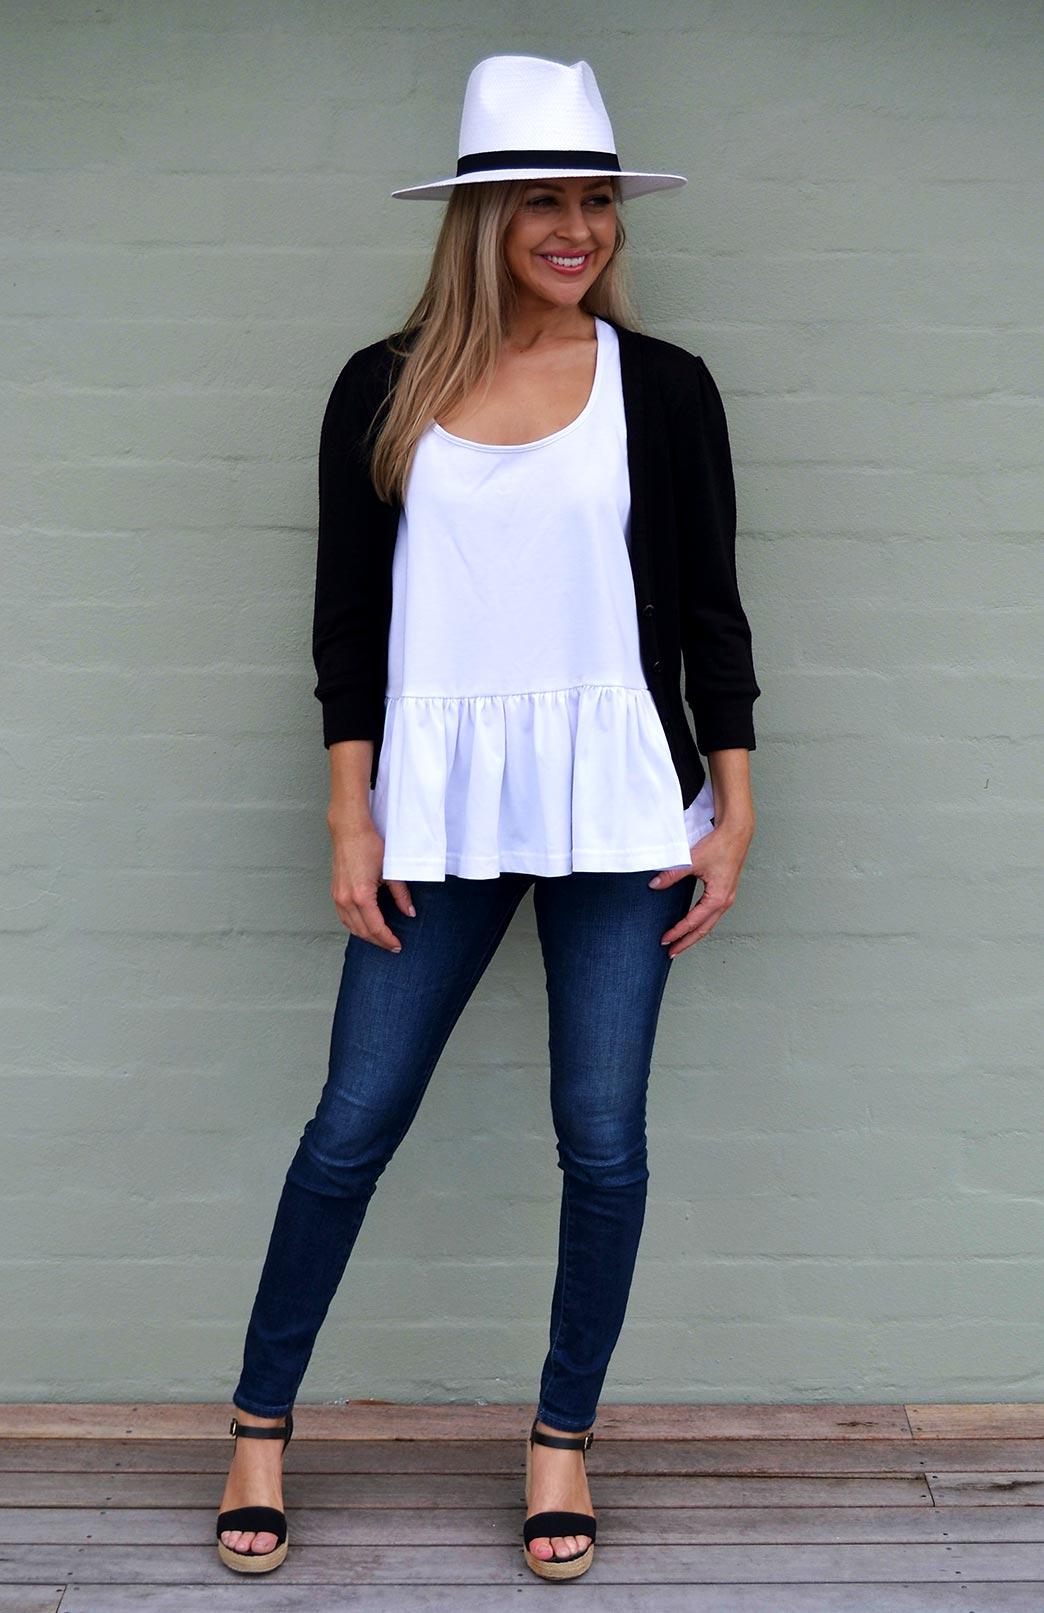 Crop Cardigan - 3/4 Sleeve - Women's Black Crop Short Cardigan with 3/4 Sleeves and Buttons - Smitten Merino Tasmania Australia